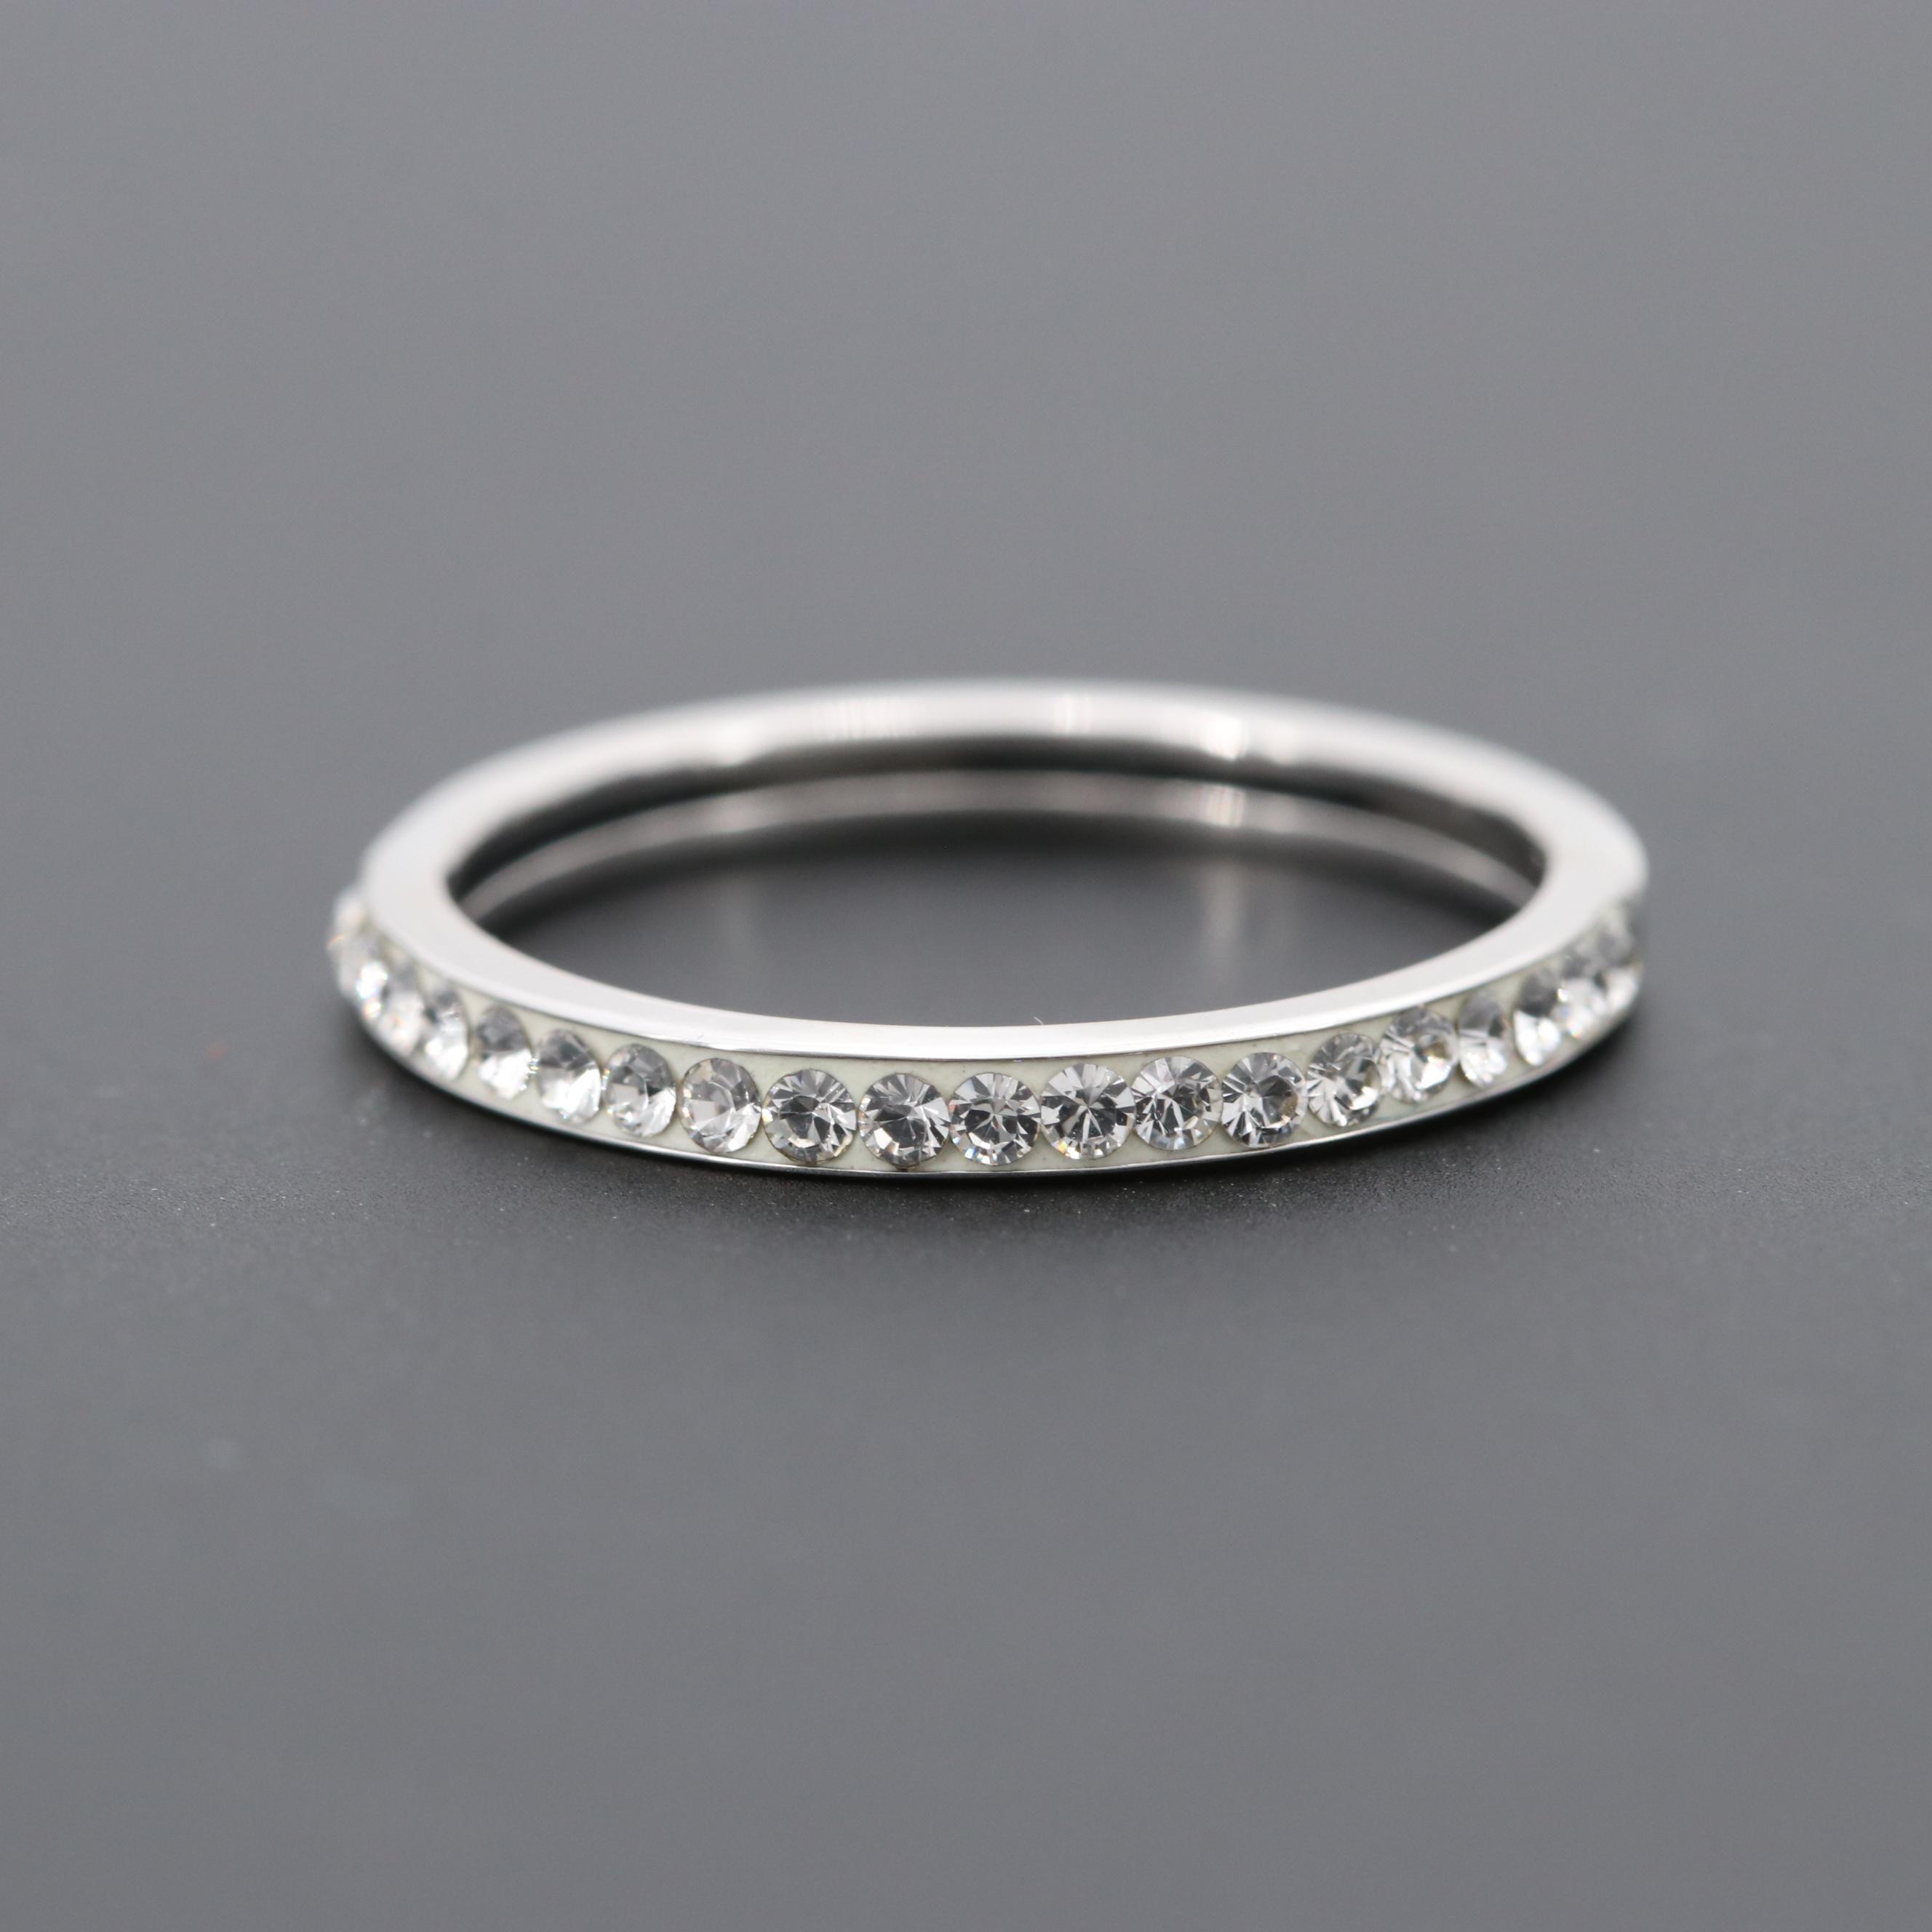 Dyadema 14K White Gold Foilback Glass Ring Band